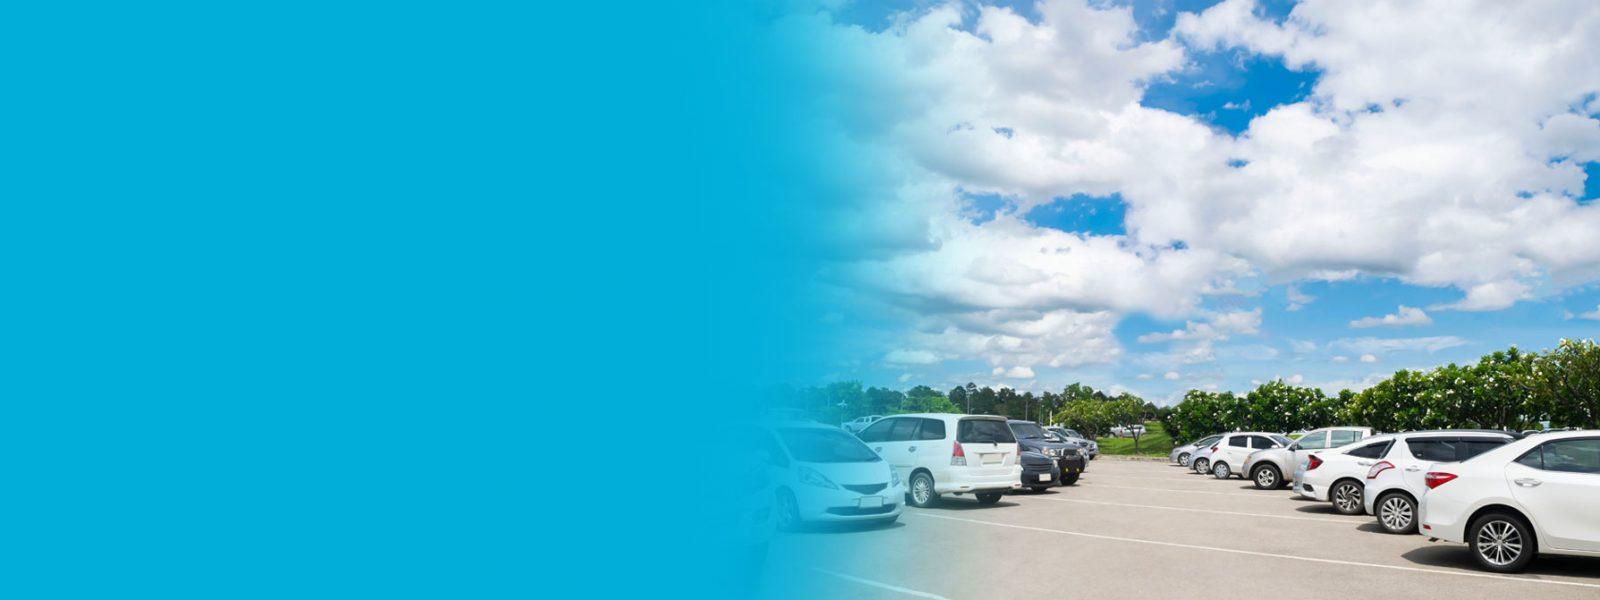 Vehicle Car Lot